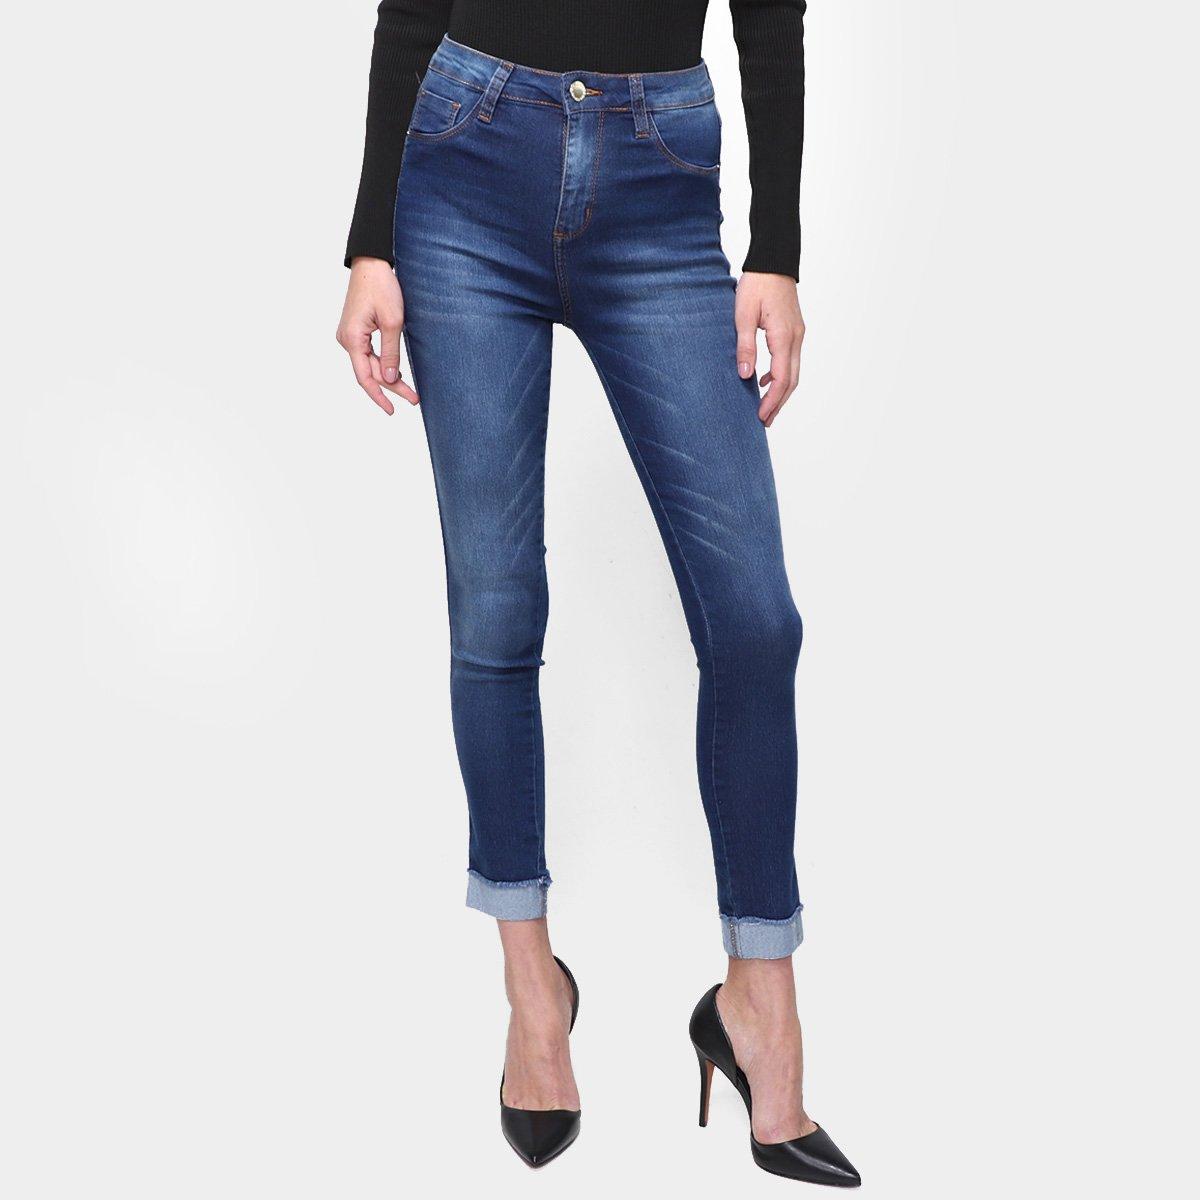 Calça Jeans Ecxo Skinny Lavagem Média Feminina